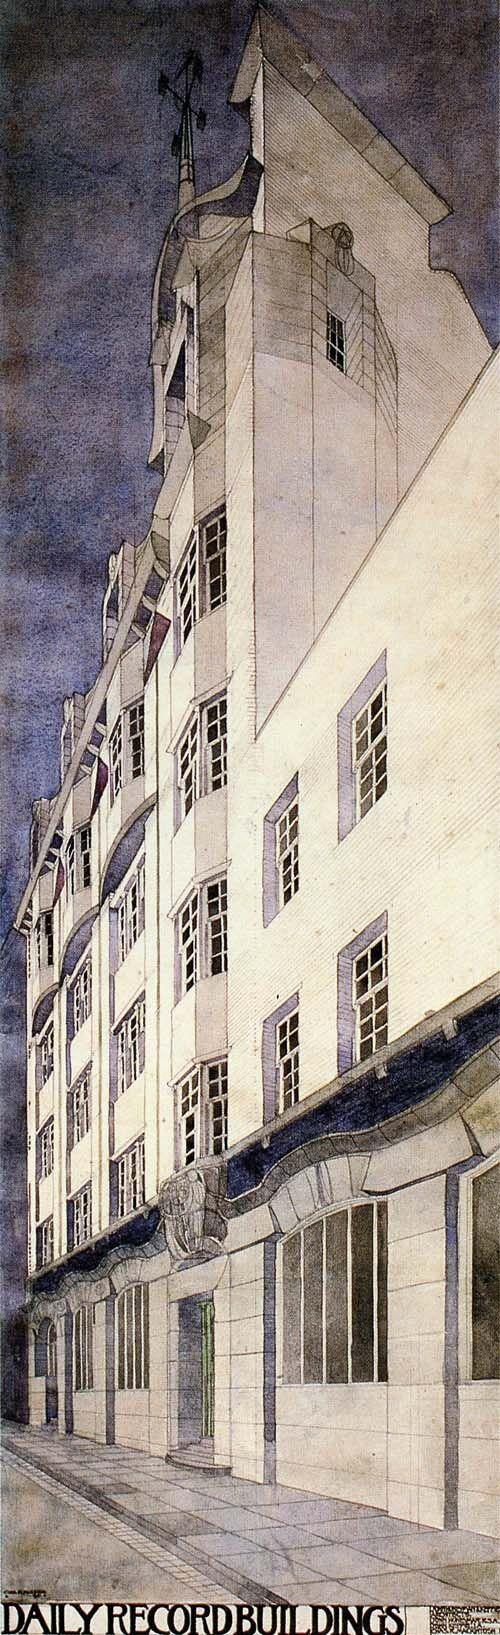 Charles Rennie MacIntosh - Daily Record Building